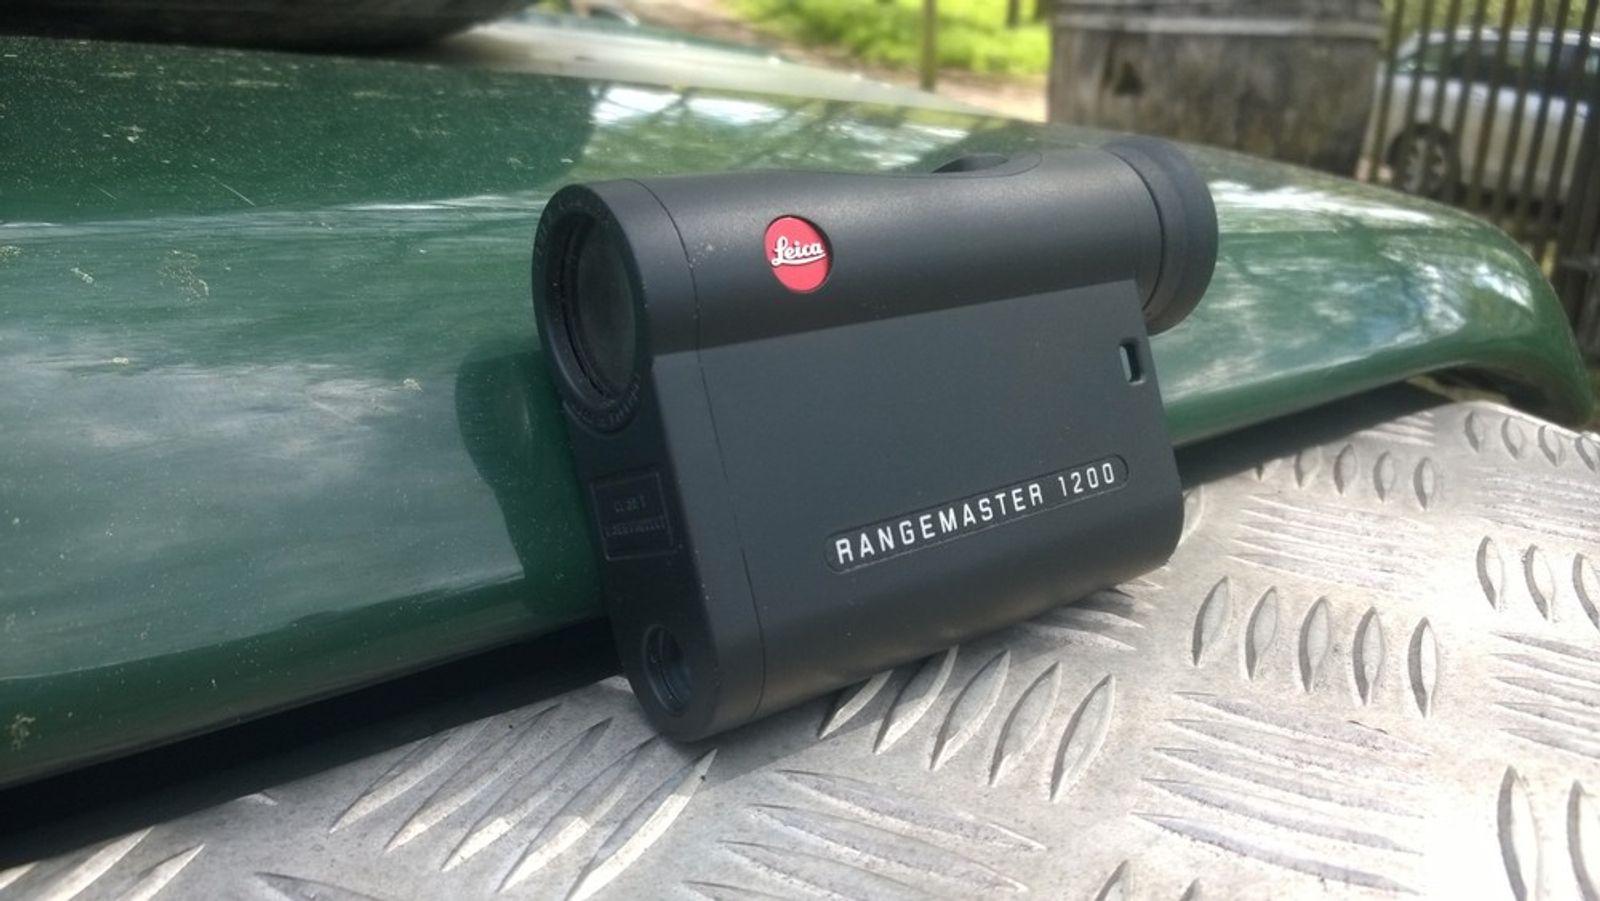 Leica Entfernungsmesser Jagd : Leica entfernungsmesser jagd gebraucht: fernglas mit